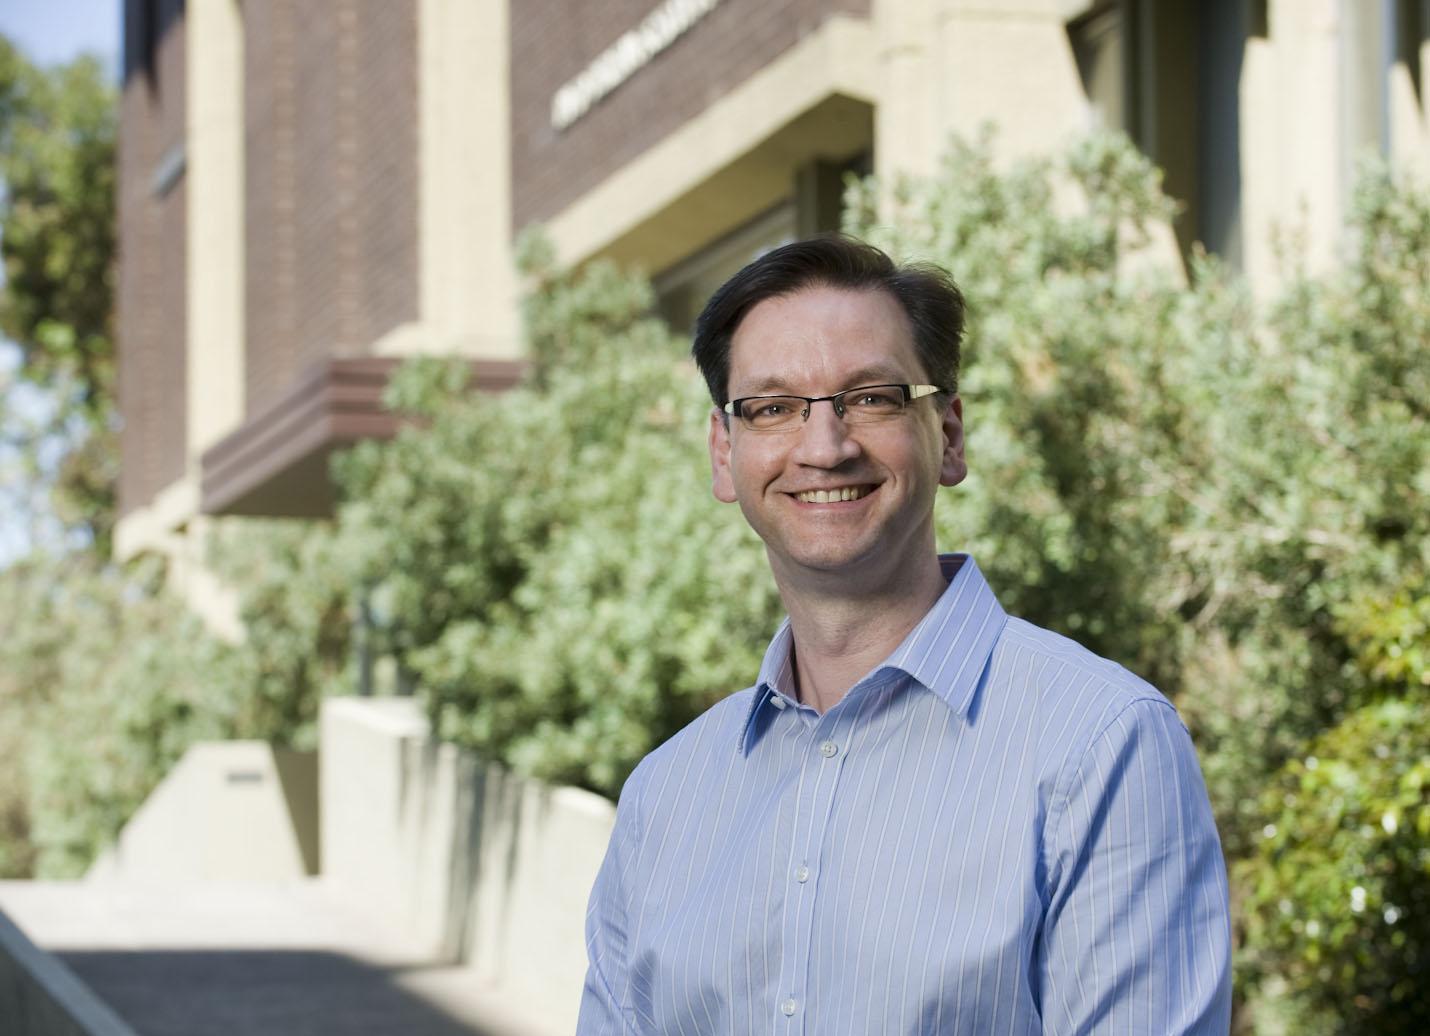 Professor Jonathan Clough, Monash University Australia is speaking at ICCCF 2017